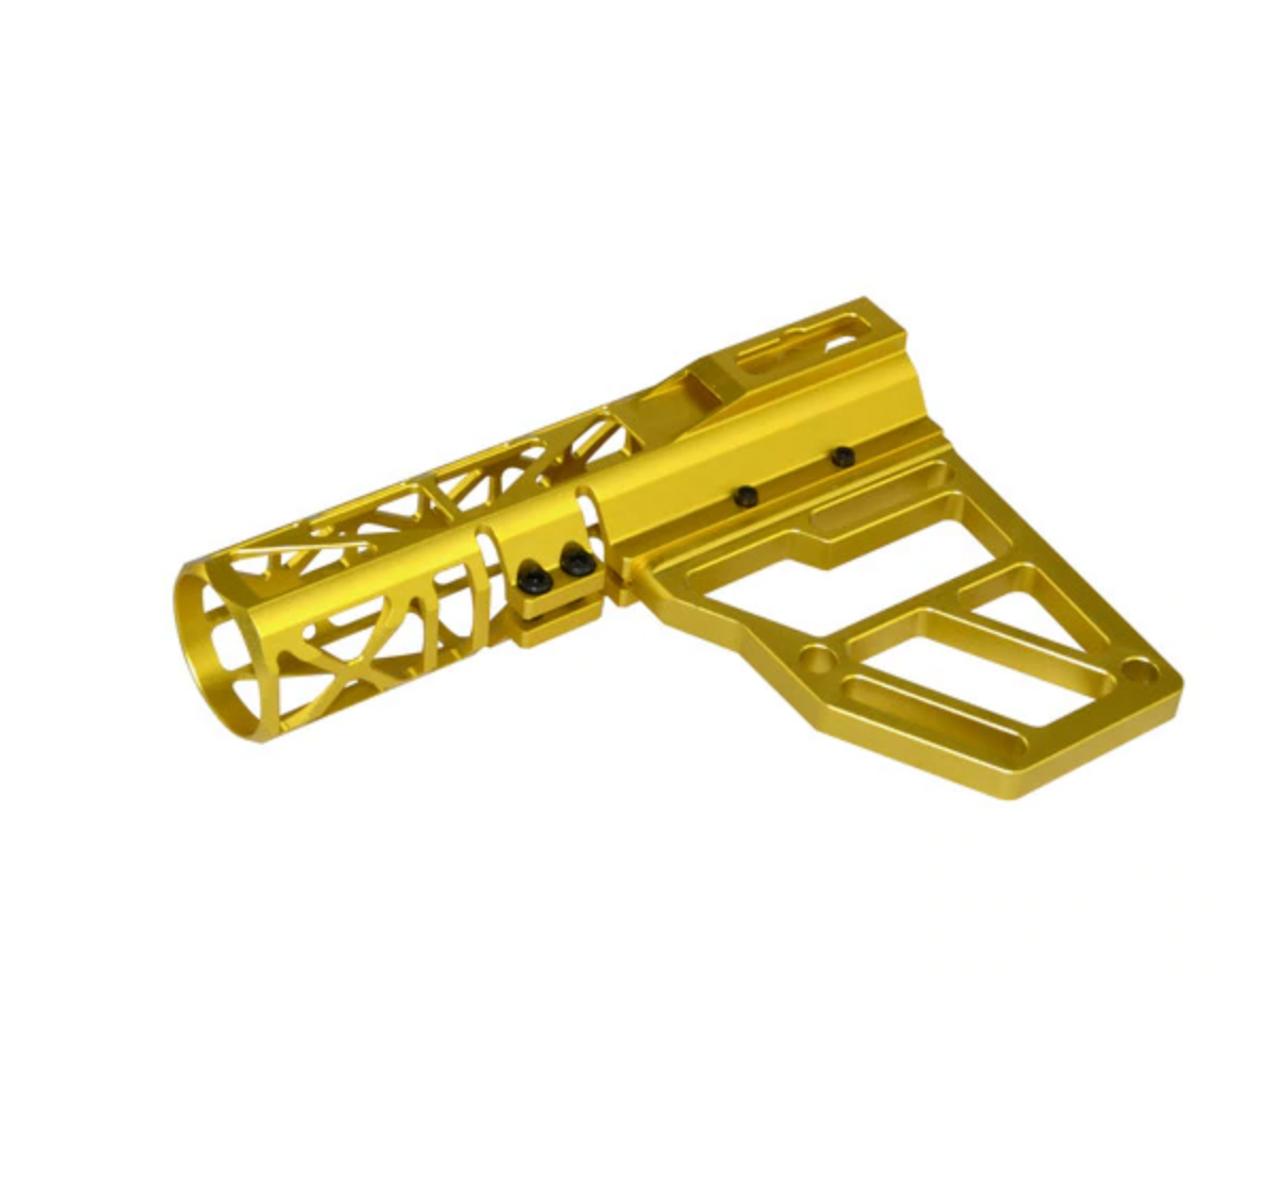 Skeletonized Pistol Brace Stabilizer, Gold Anodized Aluminum